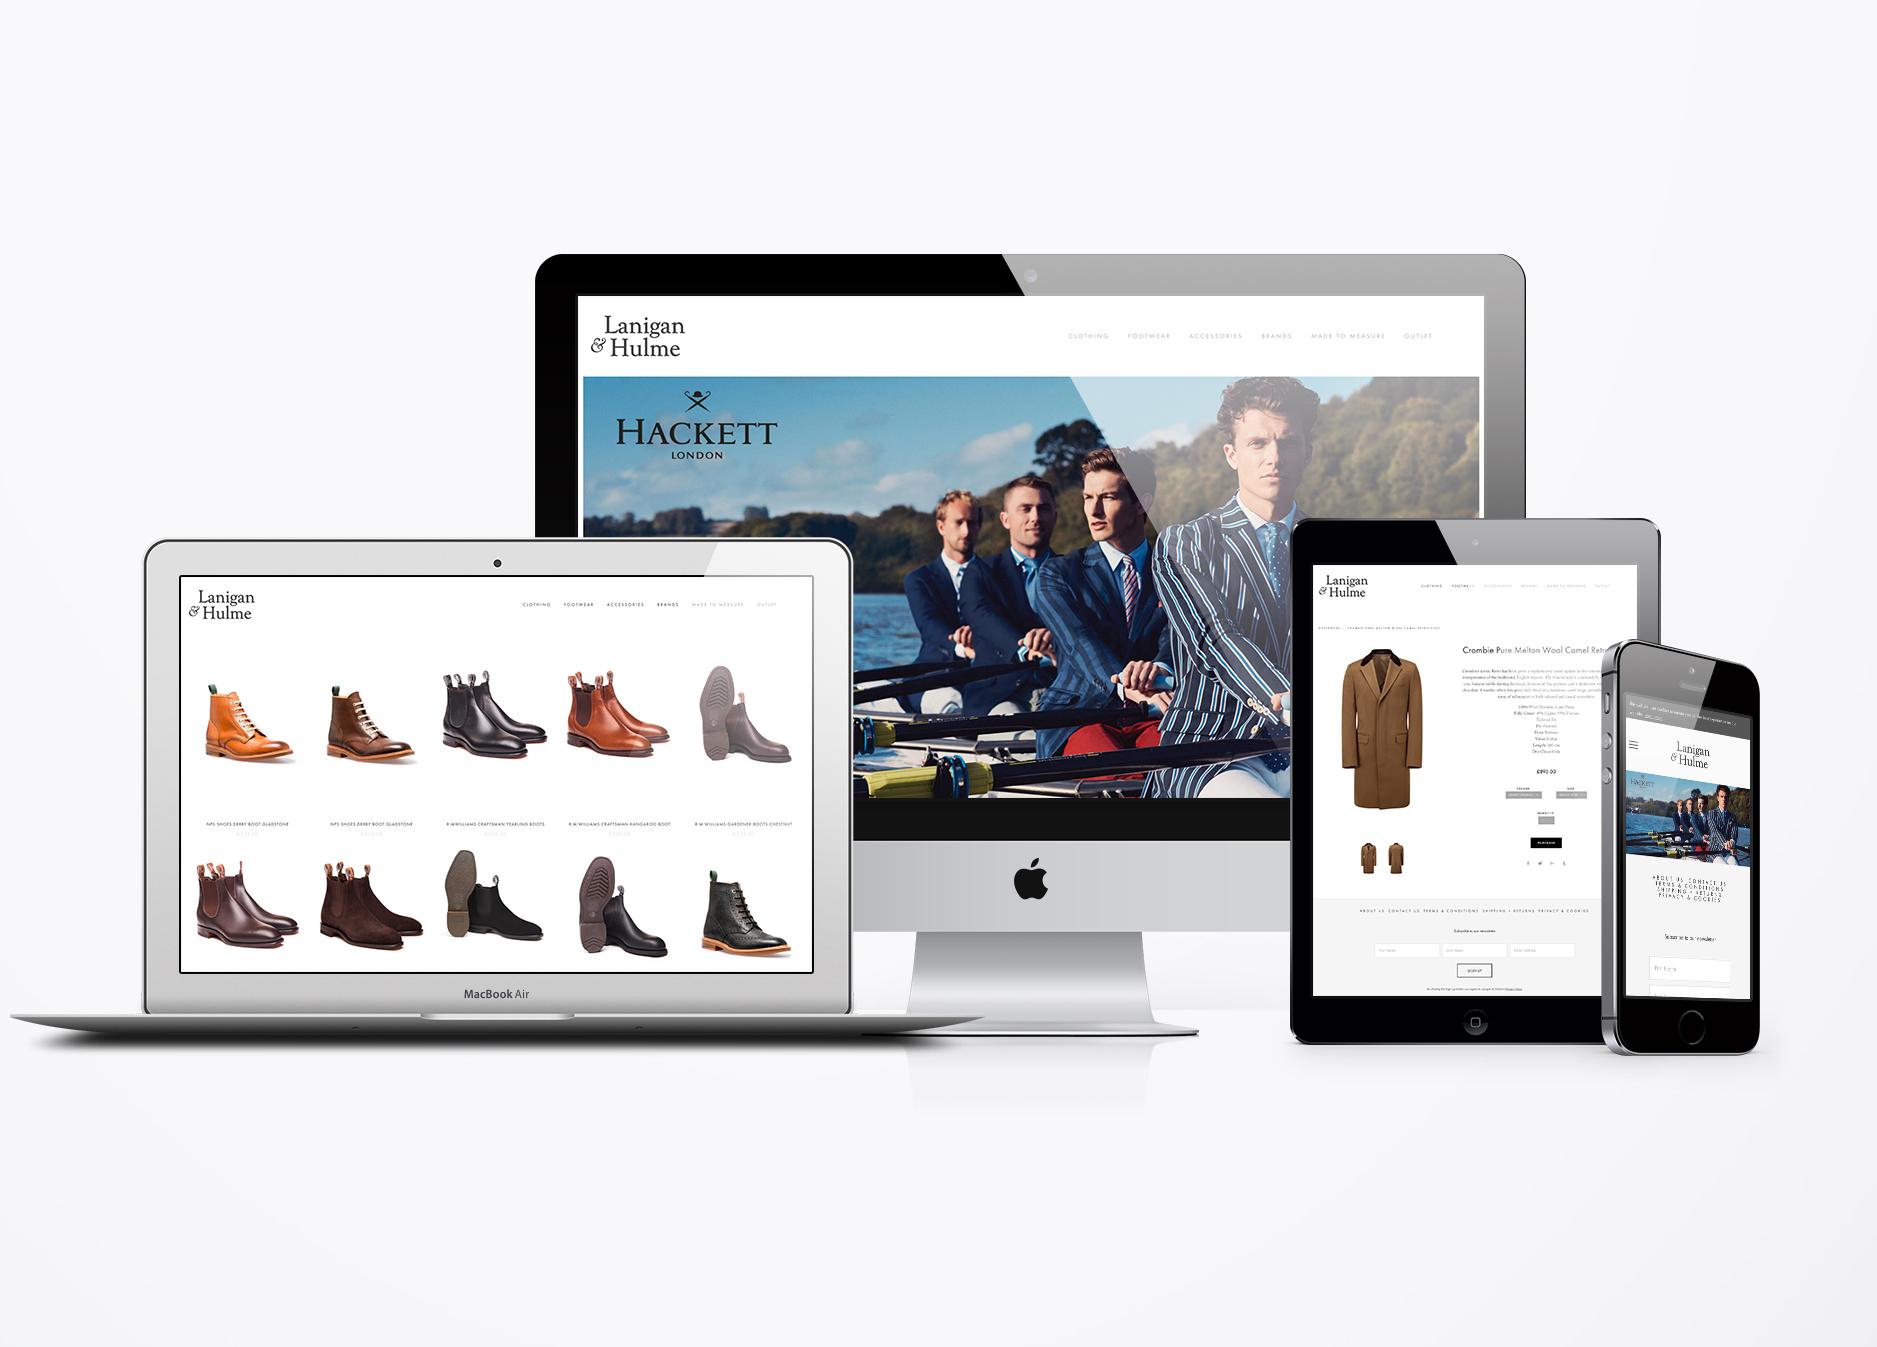 Lanigan & Hulme website